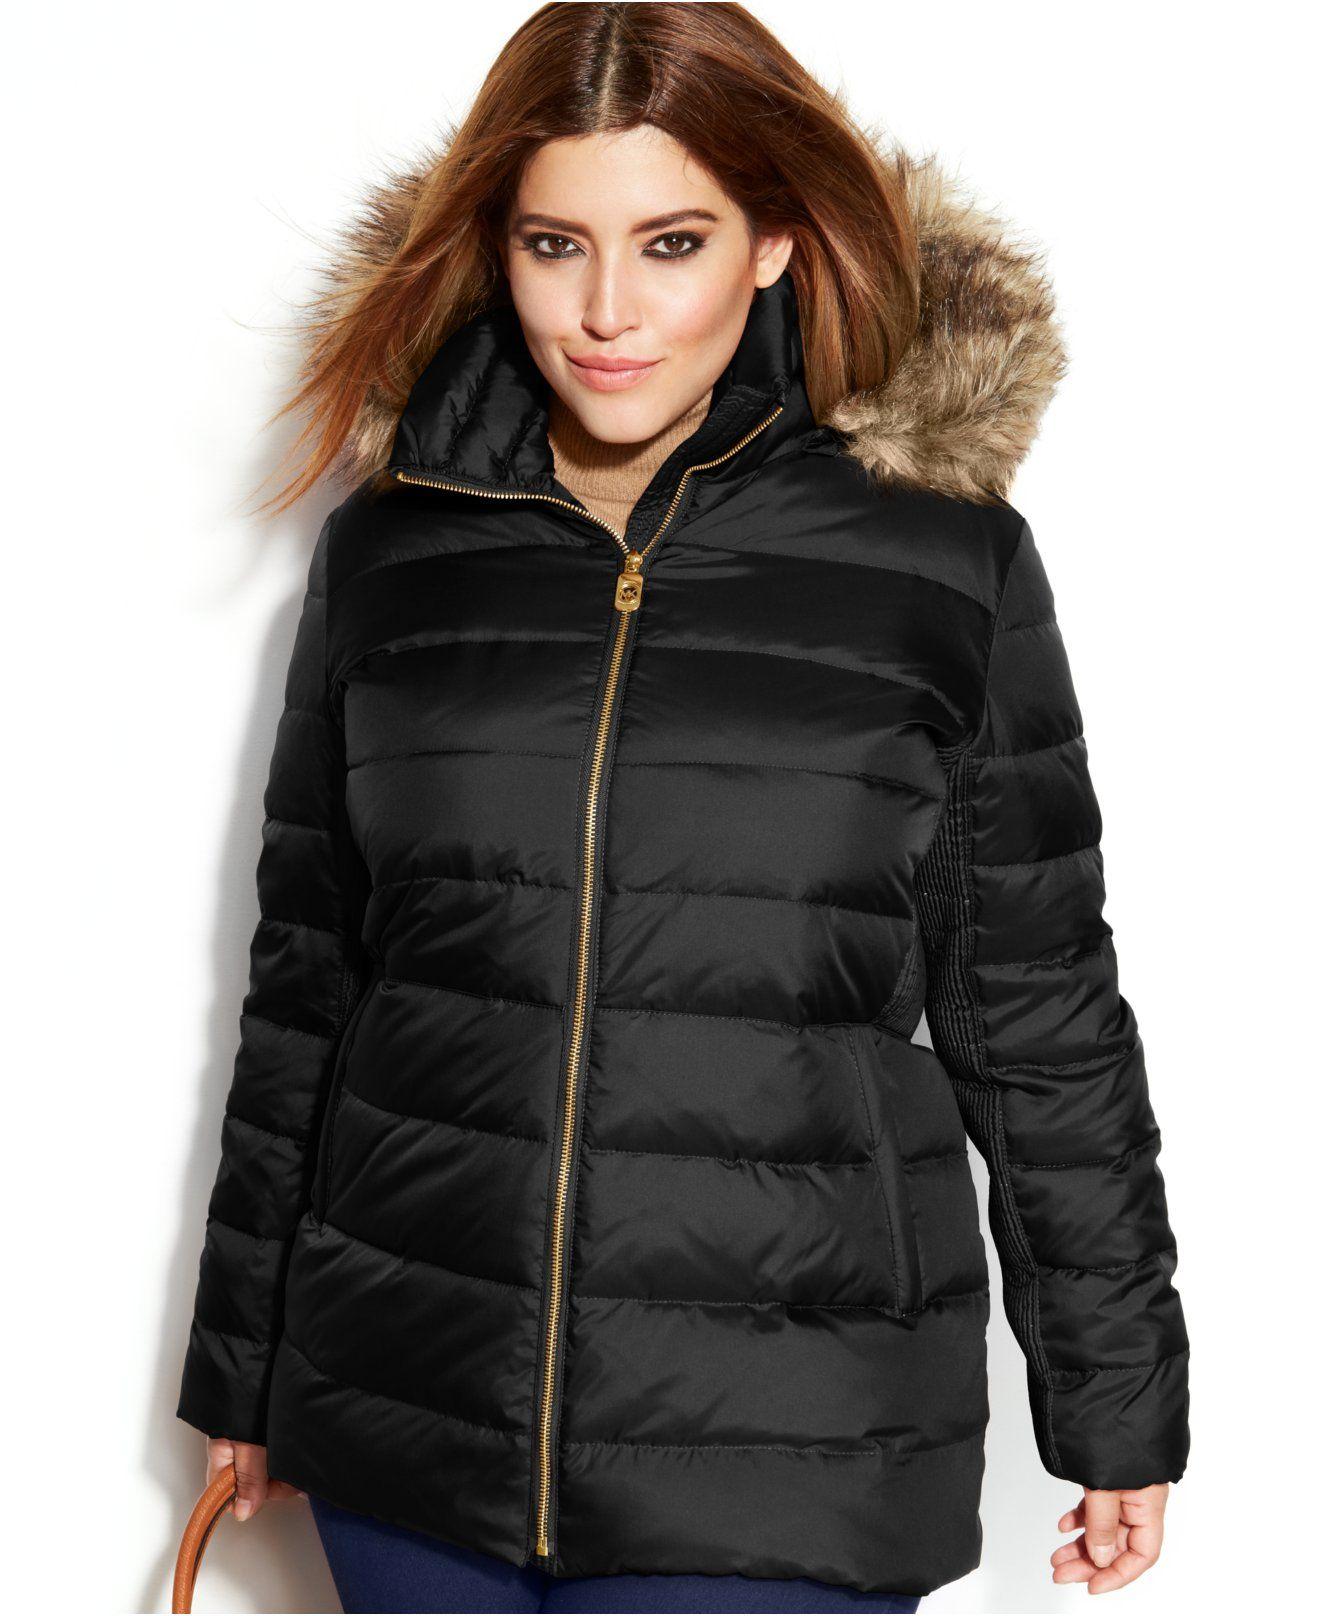 ff7fdcee7c27b MICHAEL Michael Kors Plus Size Hooded Faux-Fur-Trim Down Puffer Coat - Coats  - Plus Sizes - Macy s